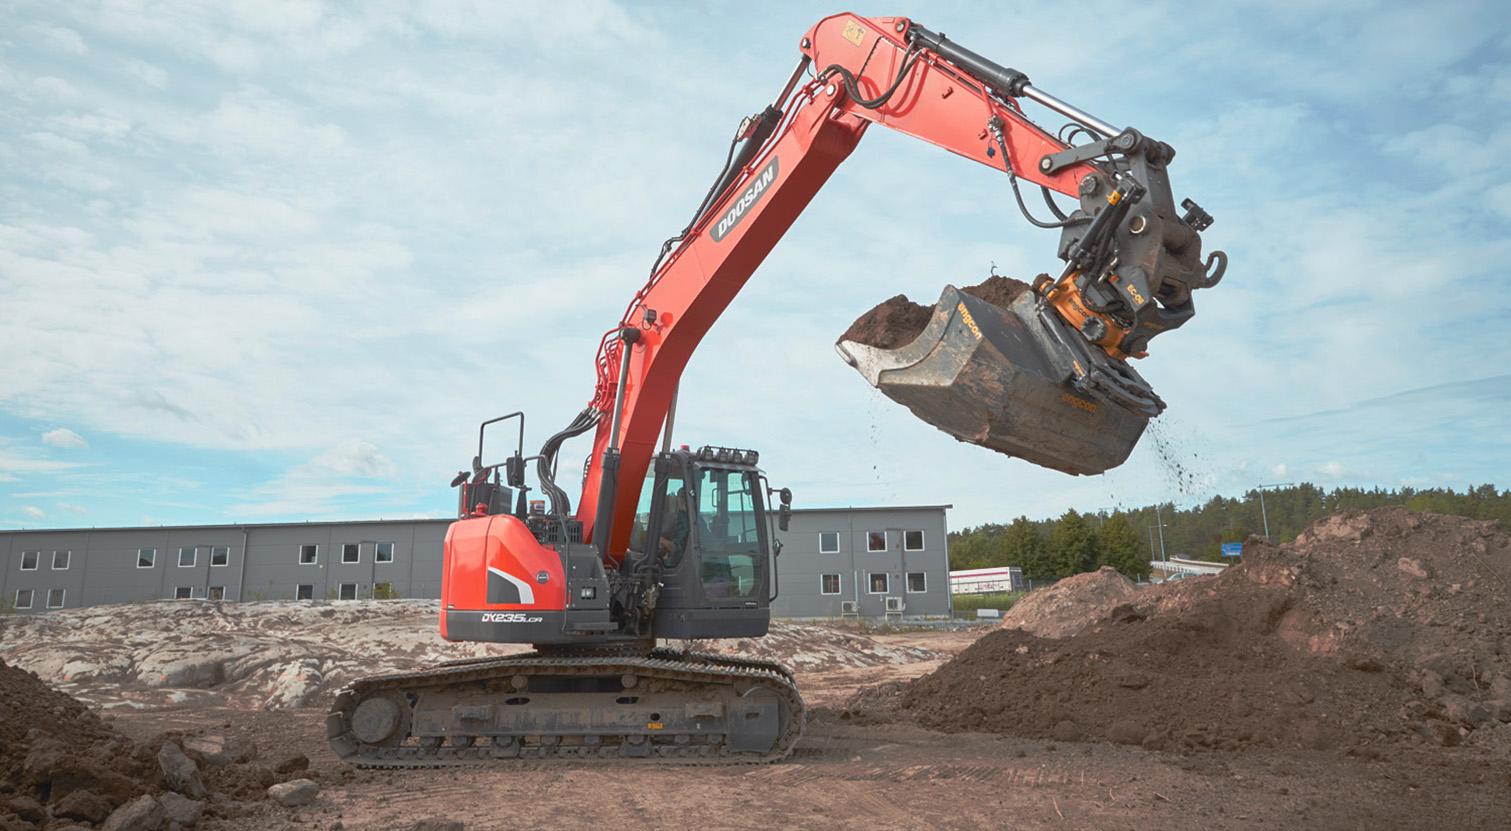 Vi som hyr ut grävmaskin i Skåne